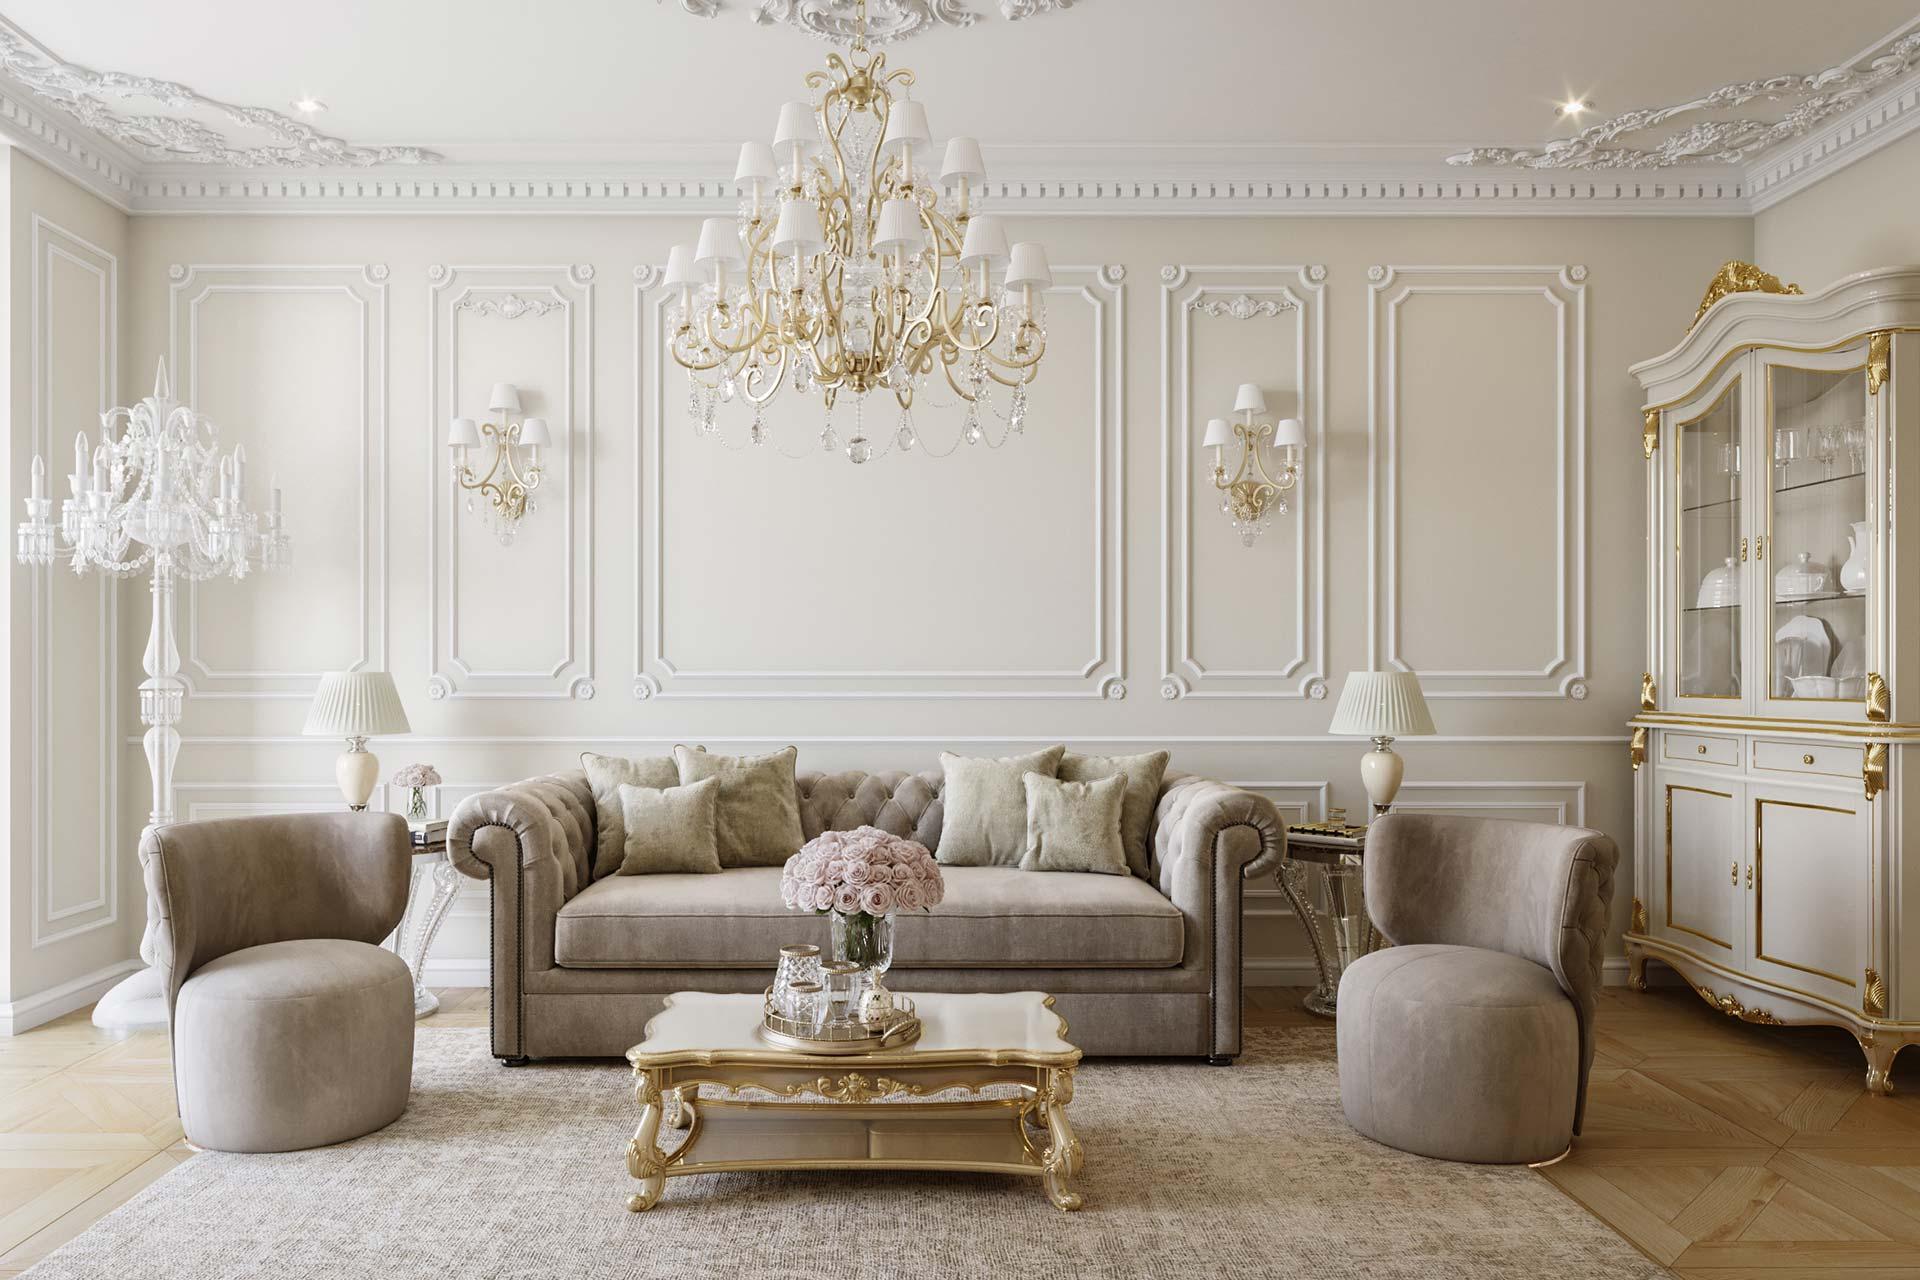 Дизайн интерьера 4-х комнатной квартиры в ЖК ЗИЛАРТ | Классический стиль